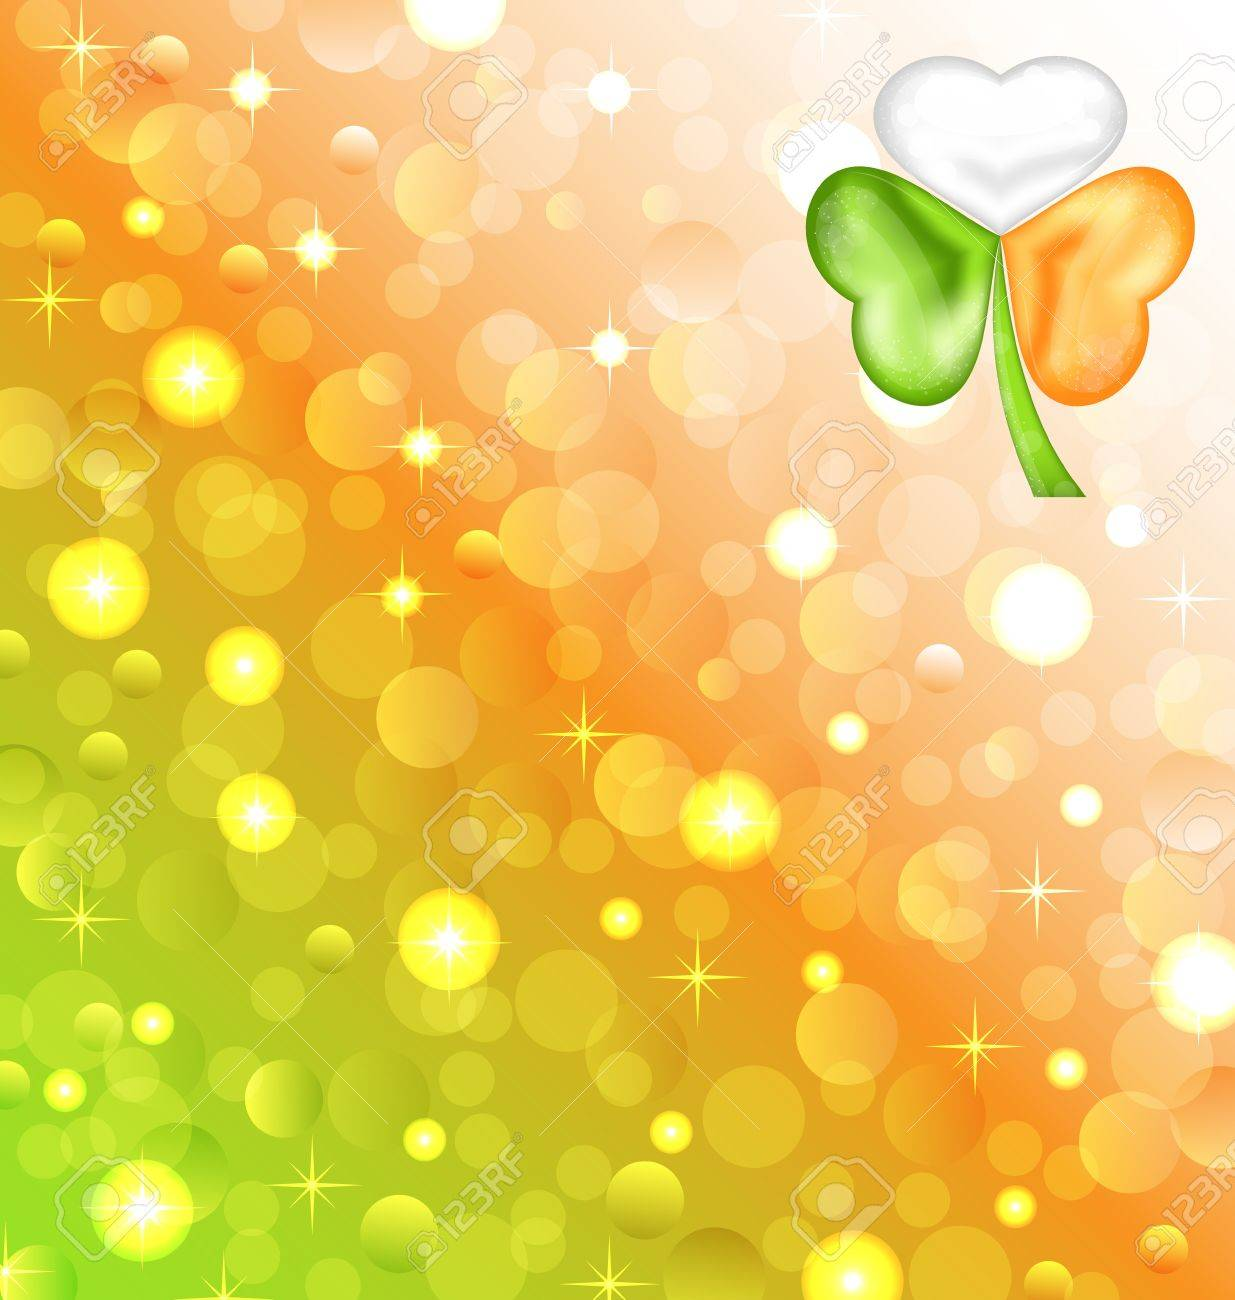 Illustration shamrock in Irish flag color for Saint Patrick day - vector Stock Vector - 17968309